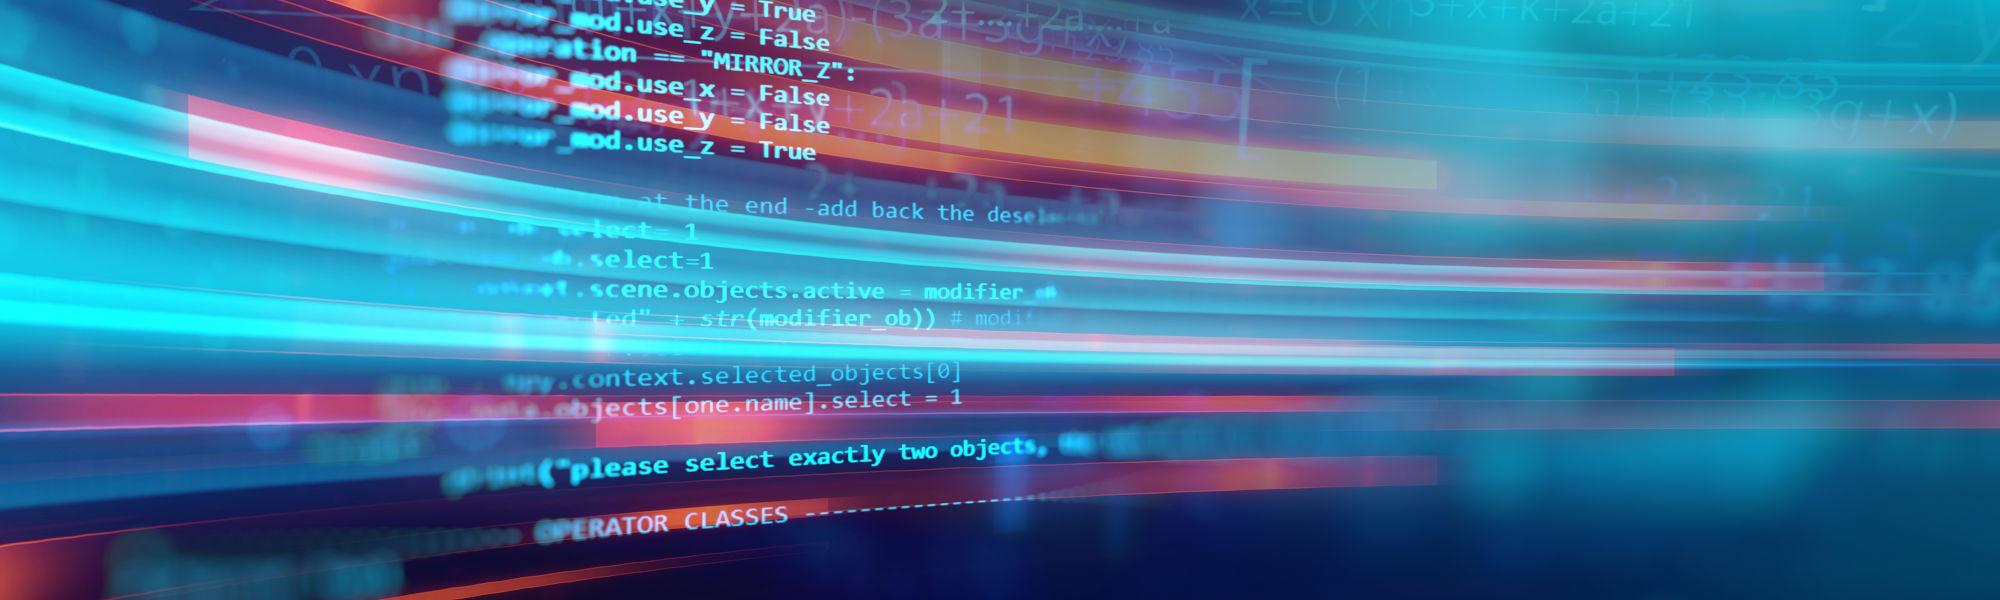 Code script blue background